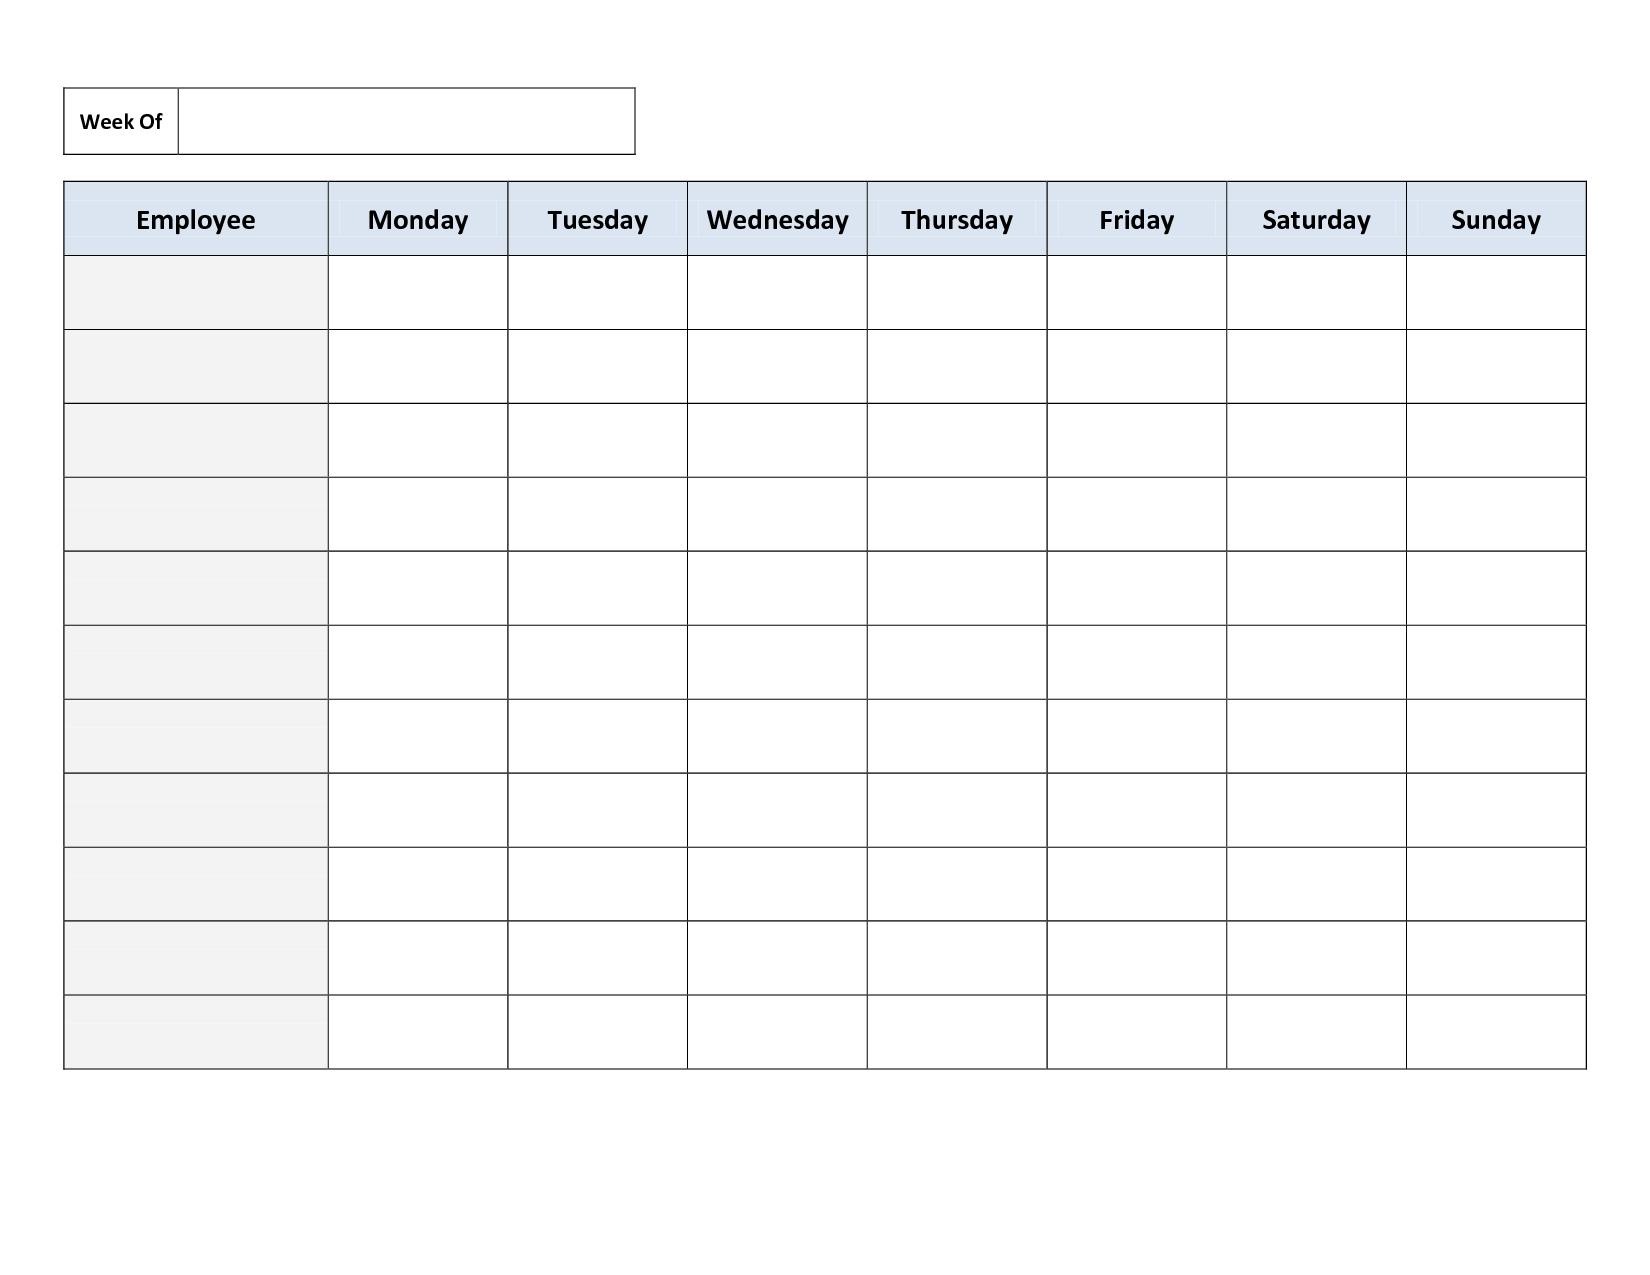 Blank Weekly Work Schedule Template   Schedule   Cleaning Schedule - Free Printable Schedule